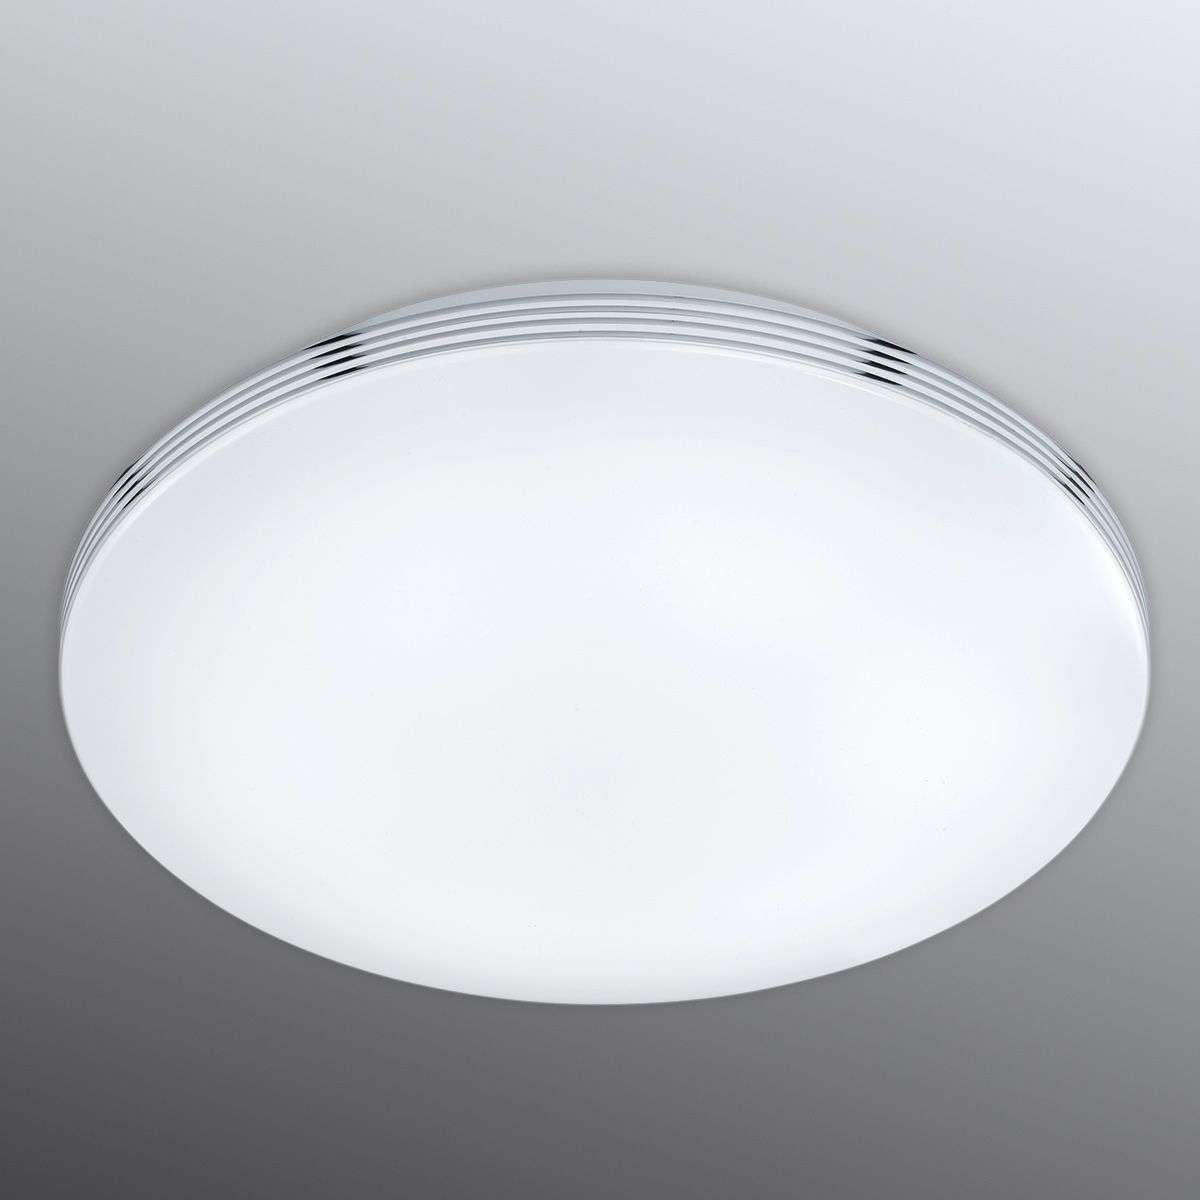 dimmable apart led bathroom ceiling light lightsie - Led Bathroom Ceiling Lights